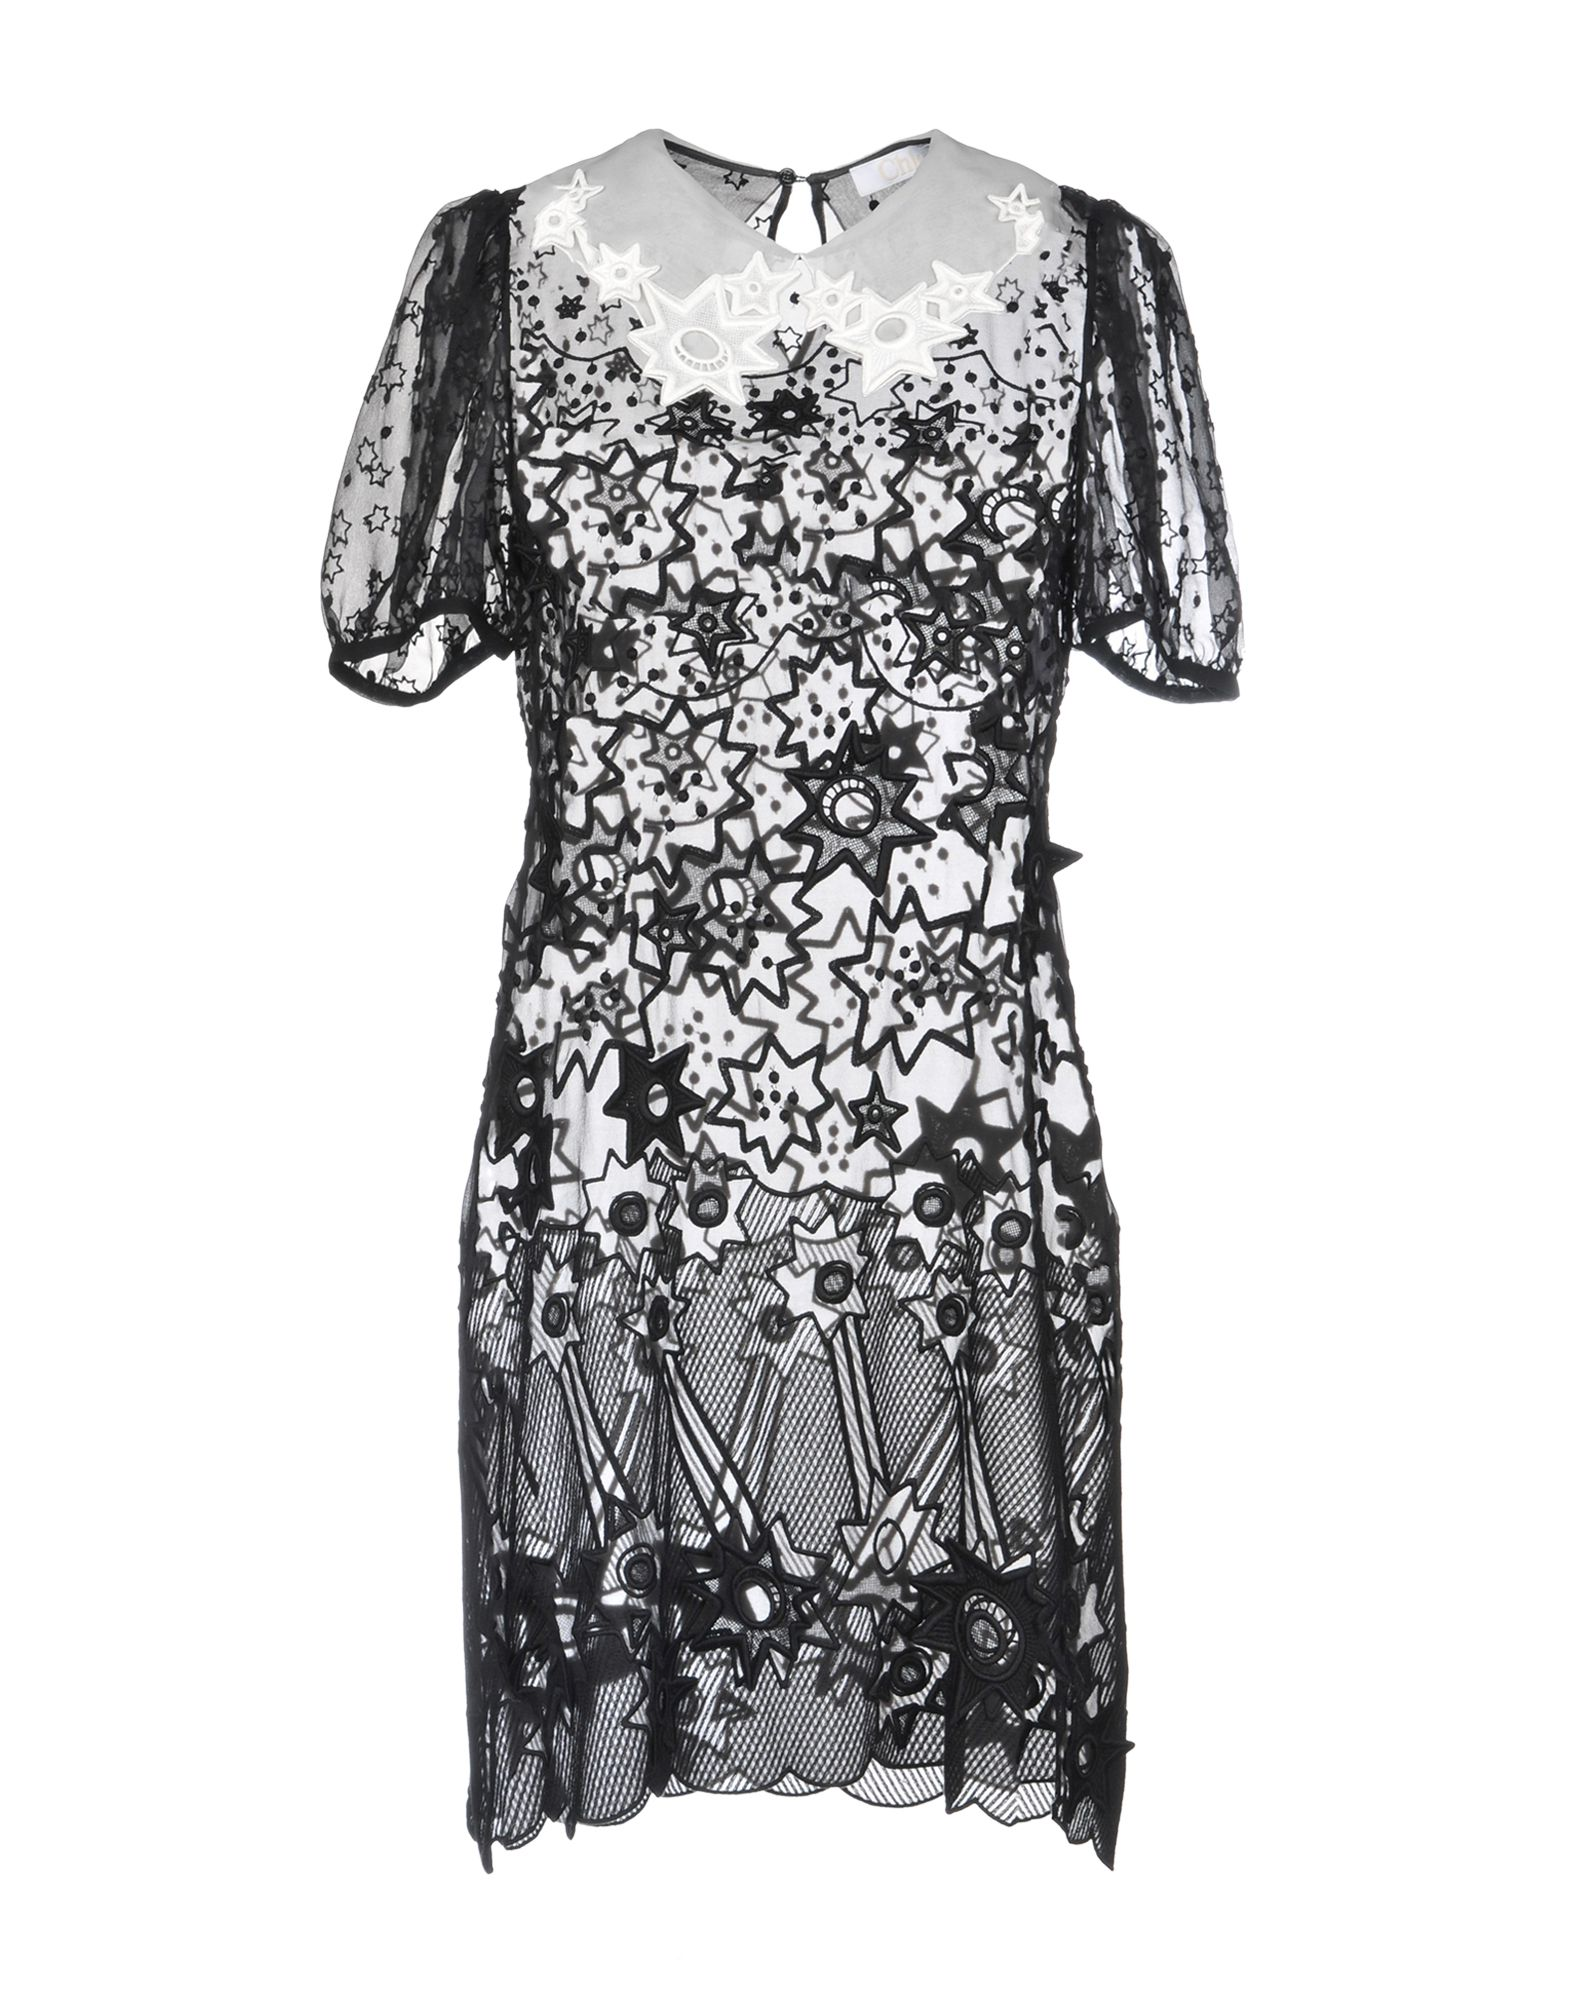 Chloé Short Dress Women Chloé Short Dresses Online On Yoox